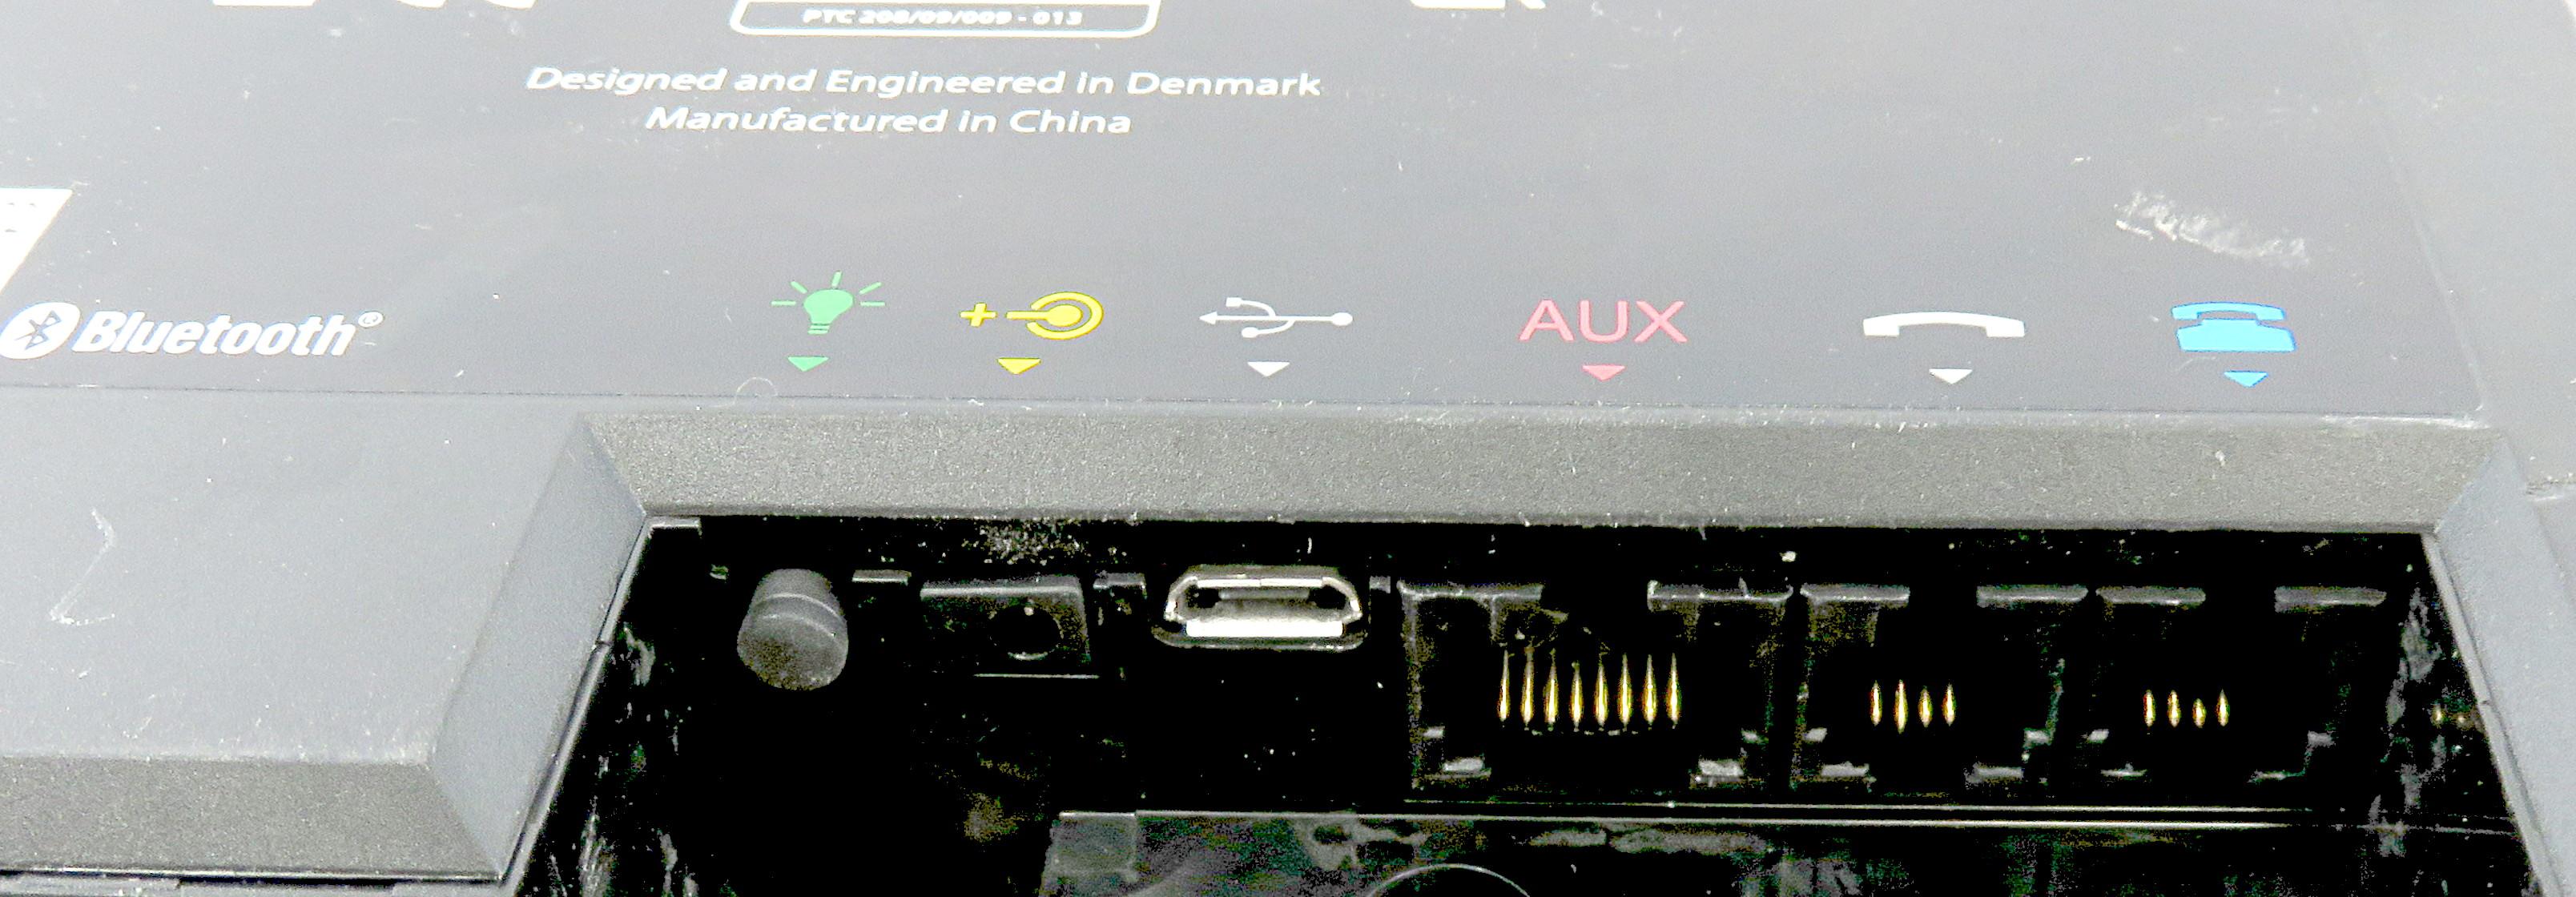 Jabra 9400BS Charging Dock For Bluetooth Wireless Headset 9460/9465/9470